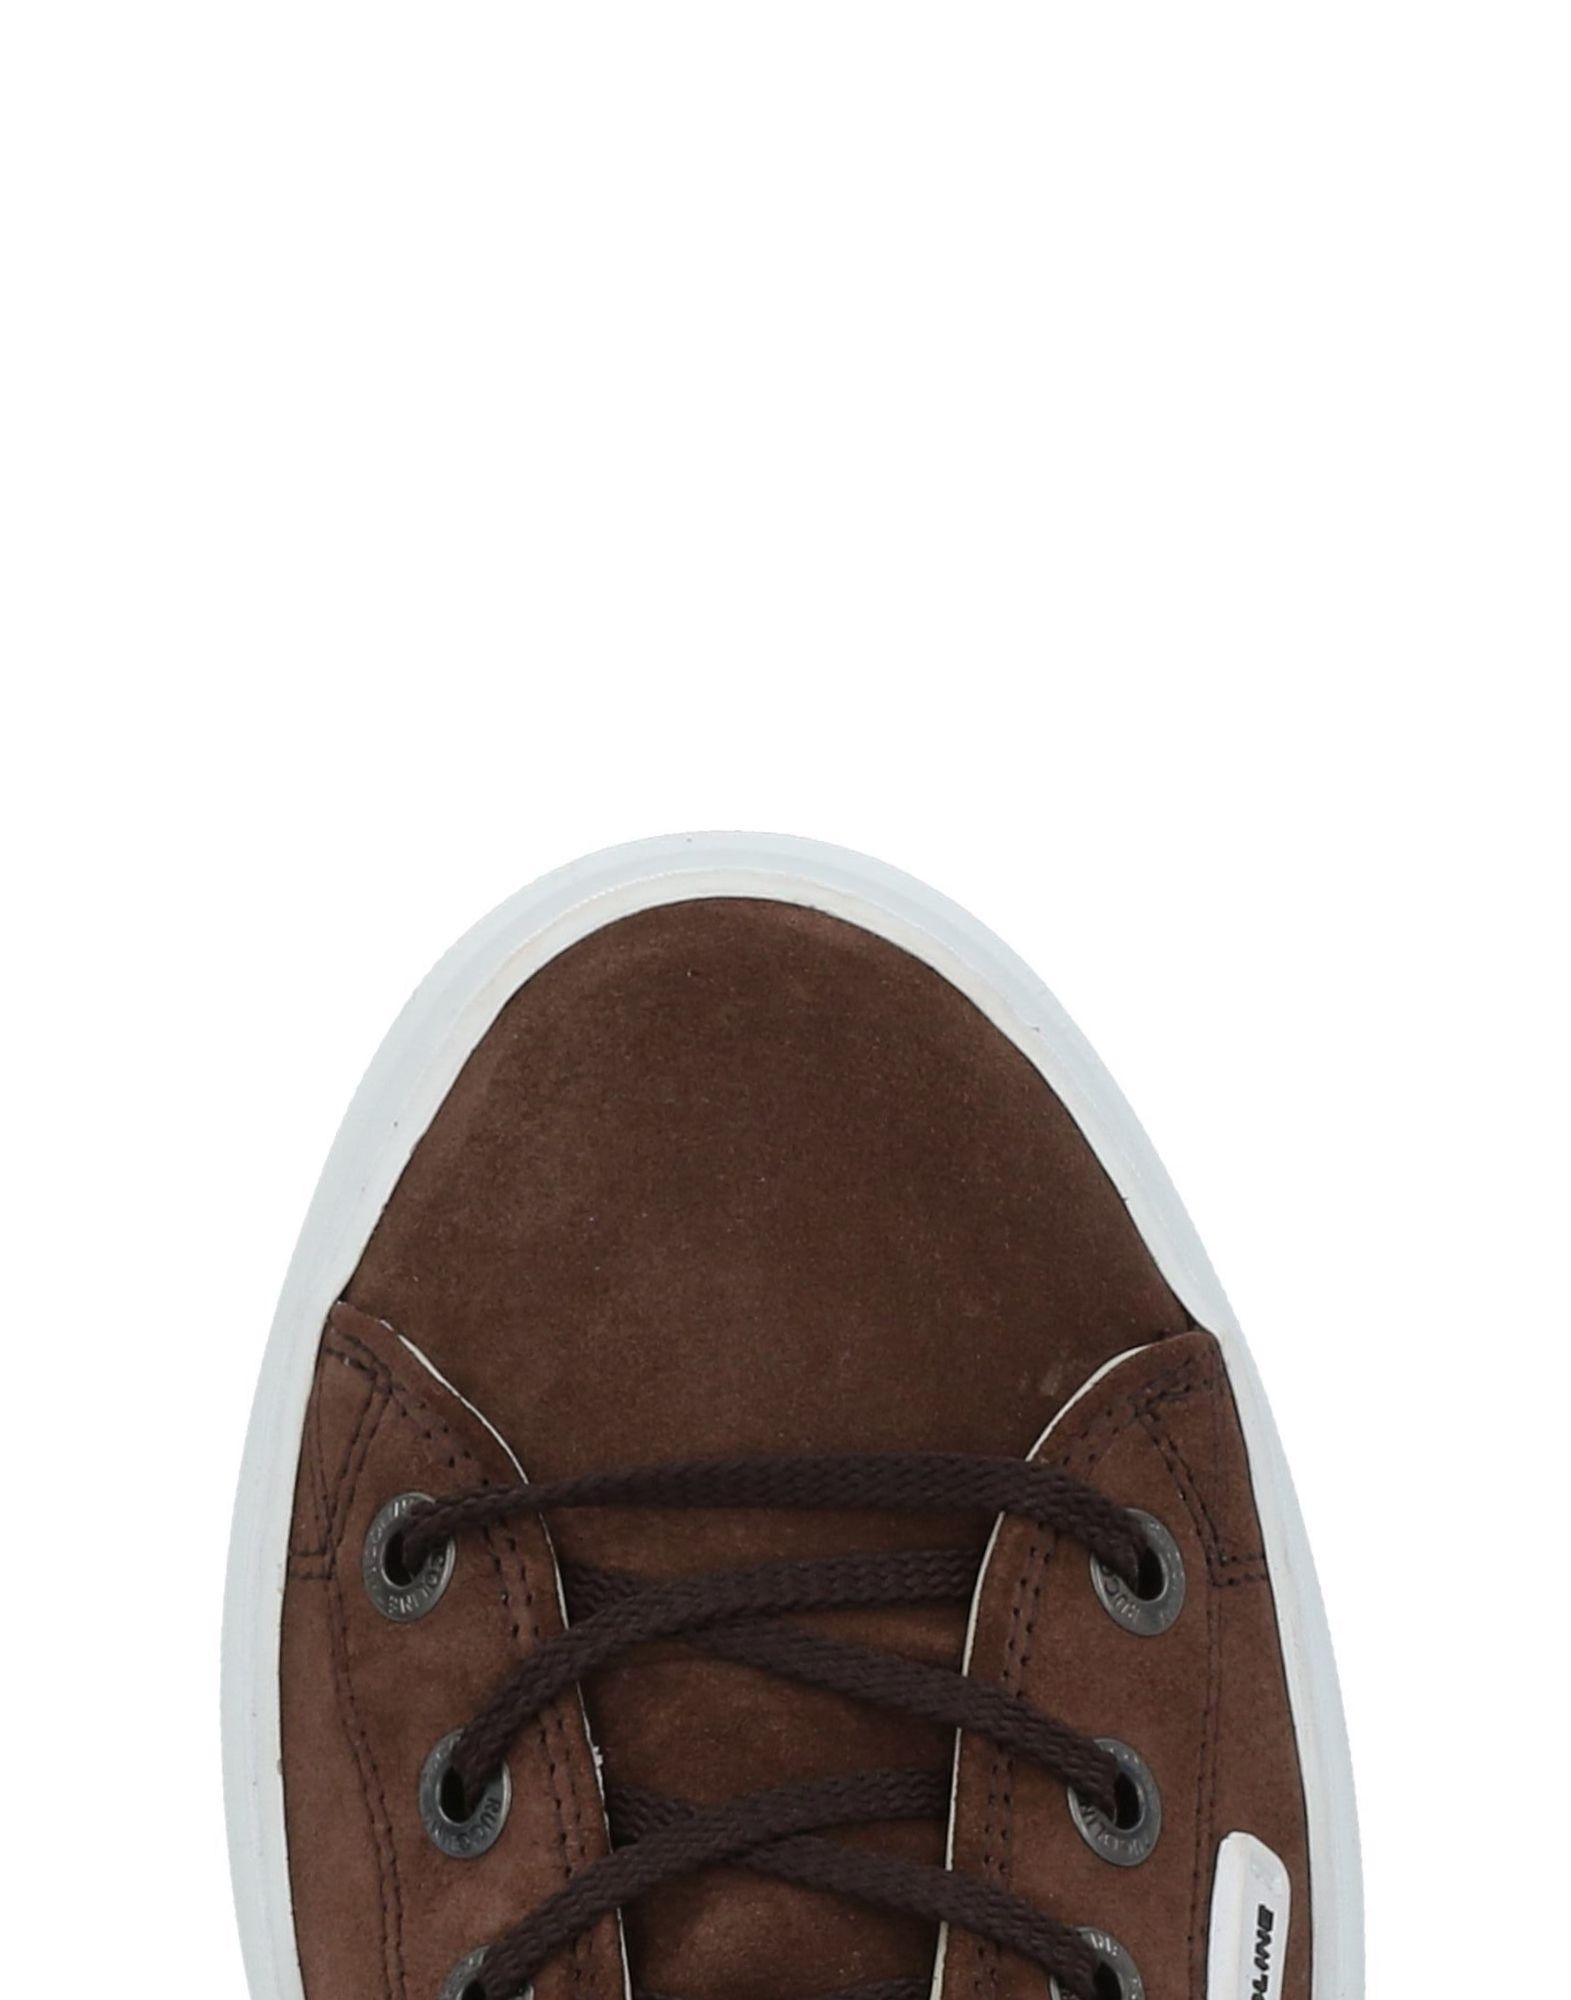 Stilvolle billige Schuhe Damen Ruco Line Sneakers Damen Schuhe  11478391TT 471962